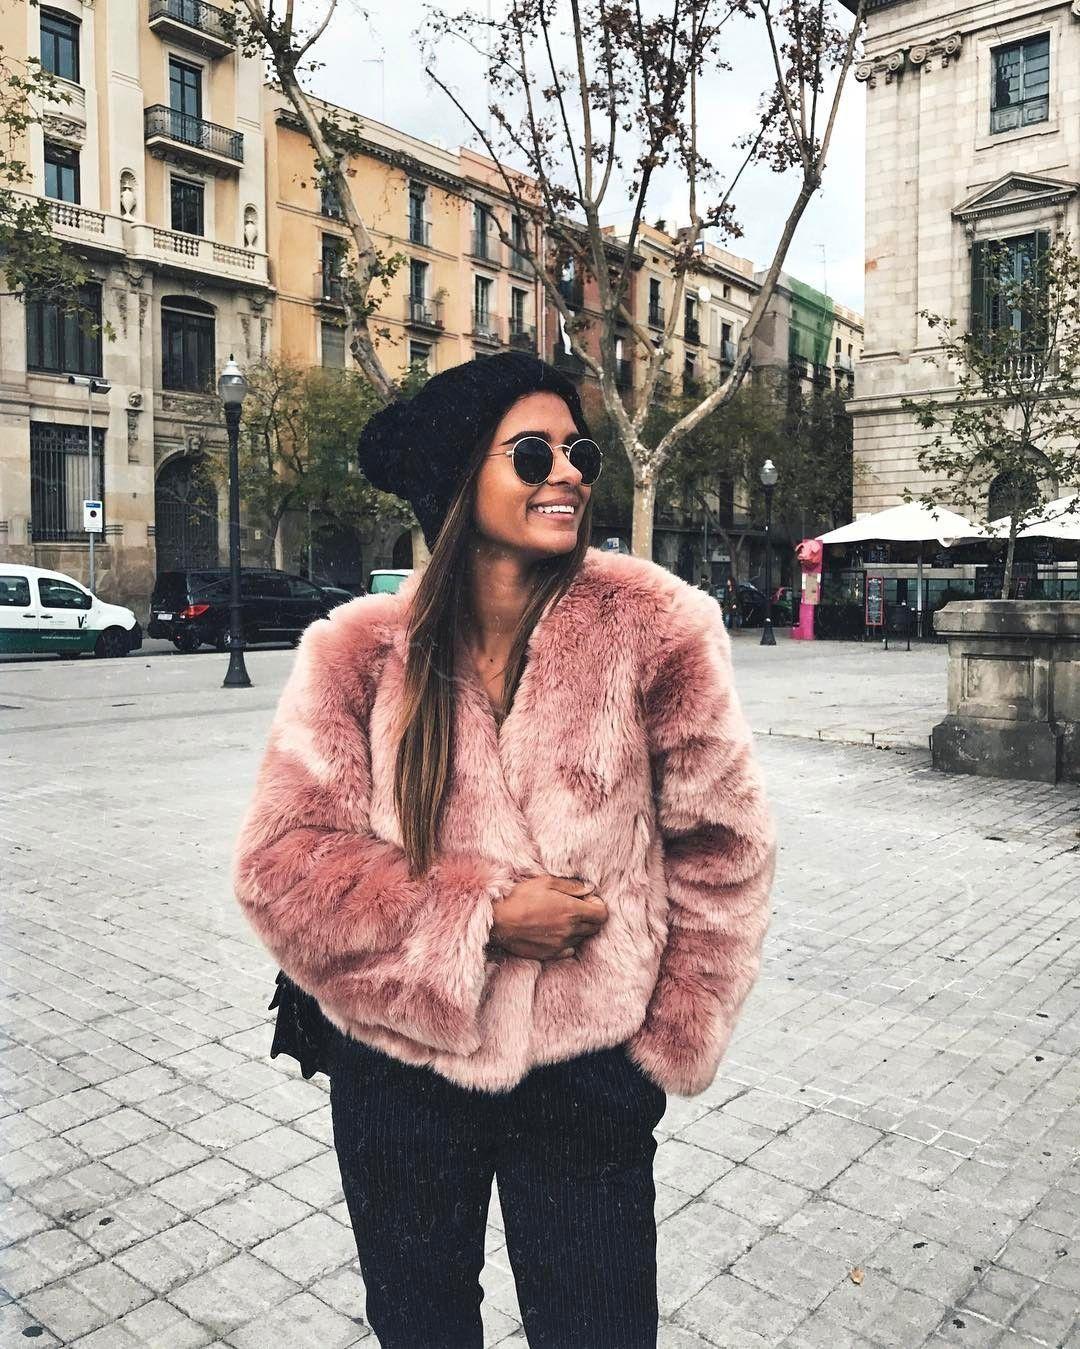 Soft And Cozy Faux Fur Jacket In Coral Pink Fur Coat Faux Fur Fashion Fur Fashion [ 1349 x 1080 Pixel ]